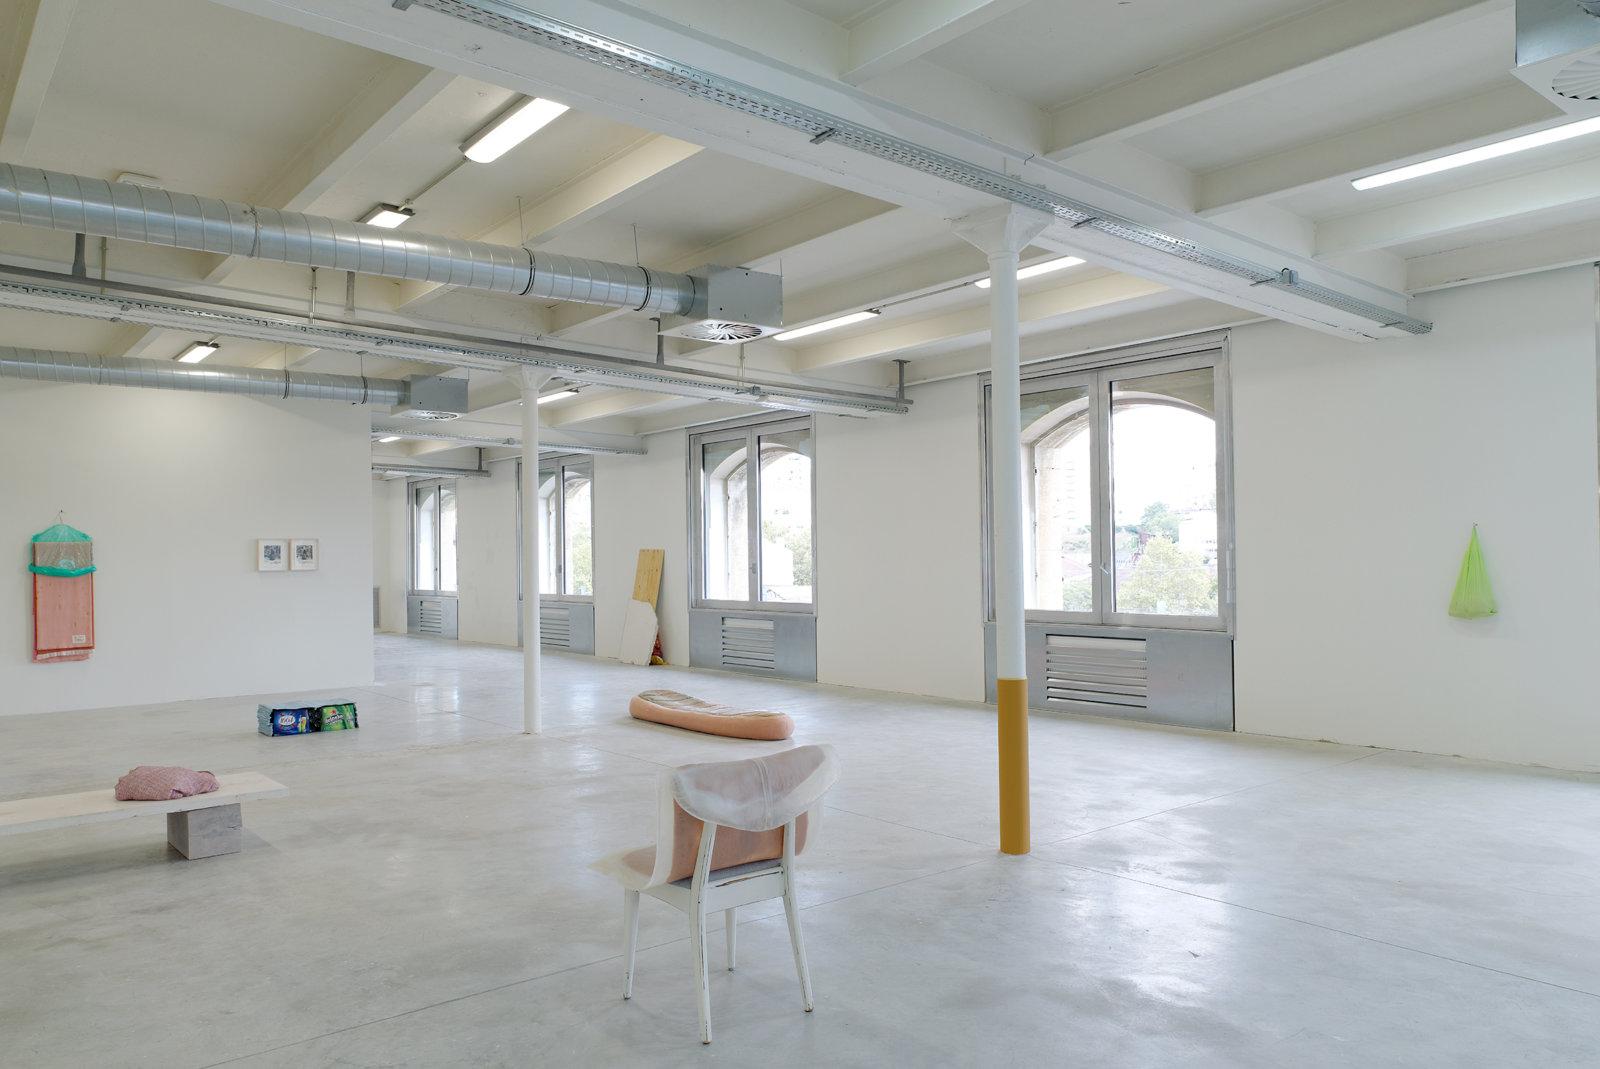 Liz Magor, installation view, No Fear, No Shame, No Confusion, Triangle France, Marseilles, 2013 by Liz Magor